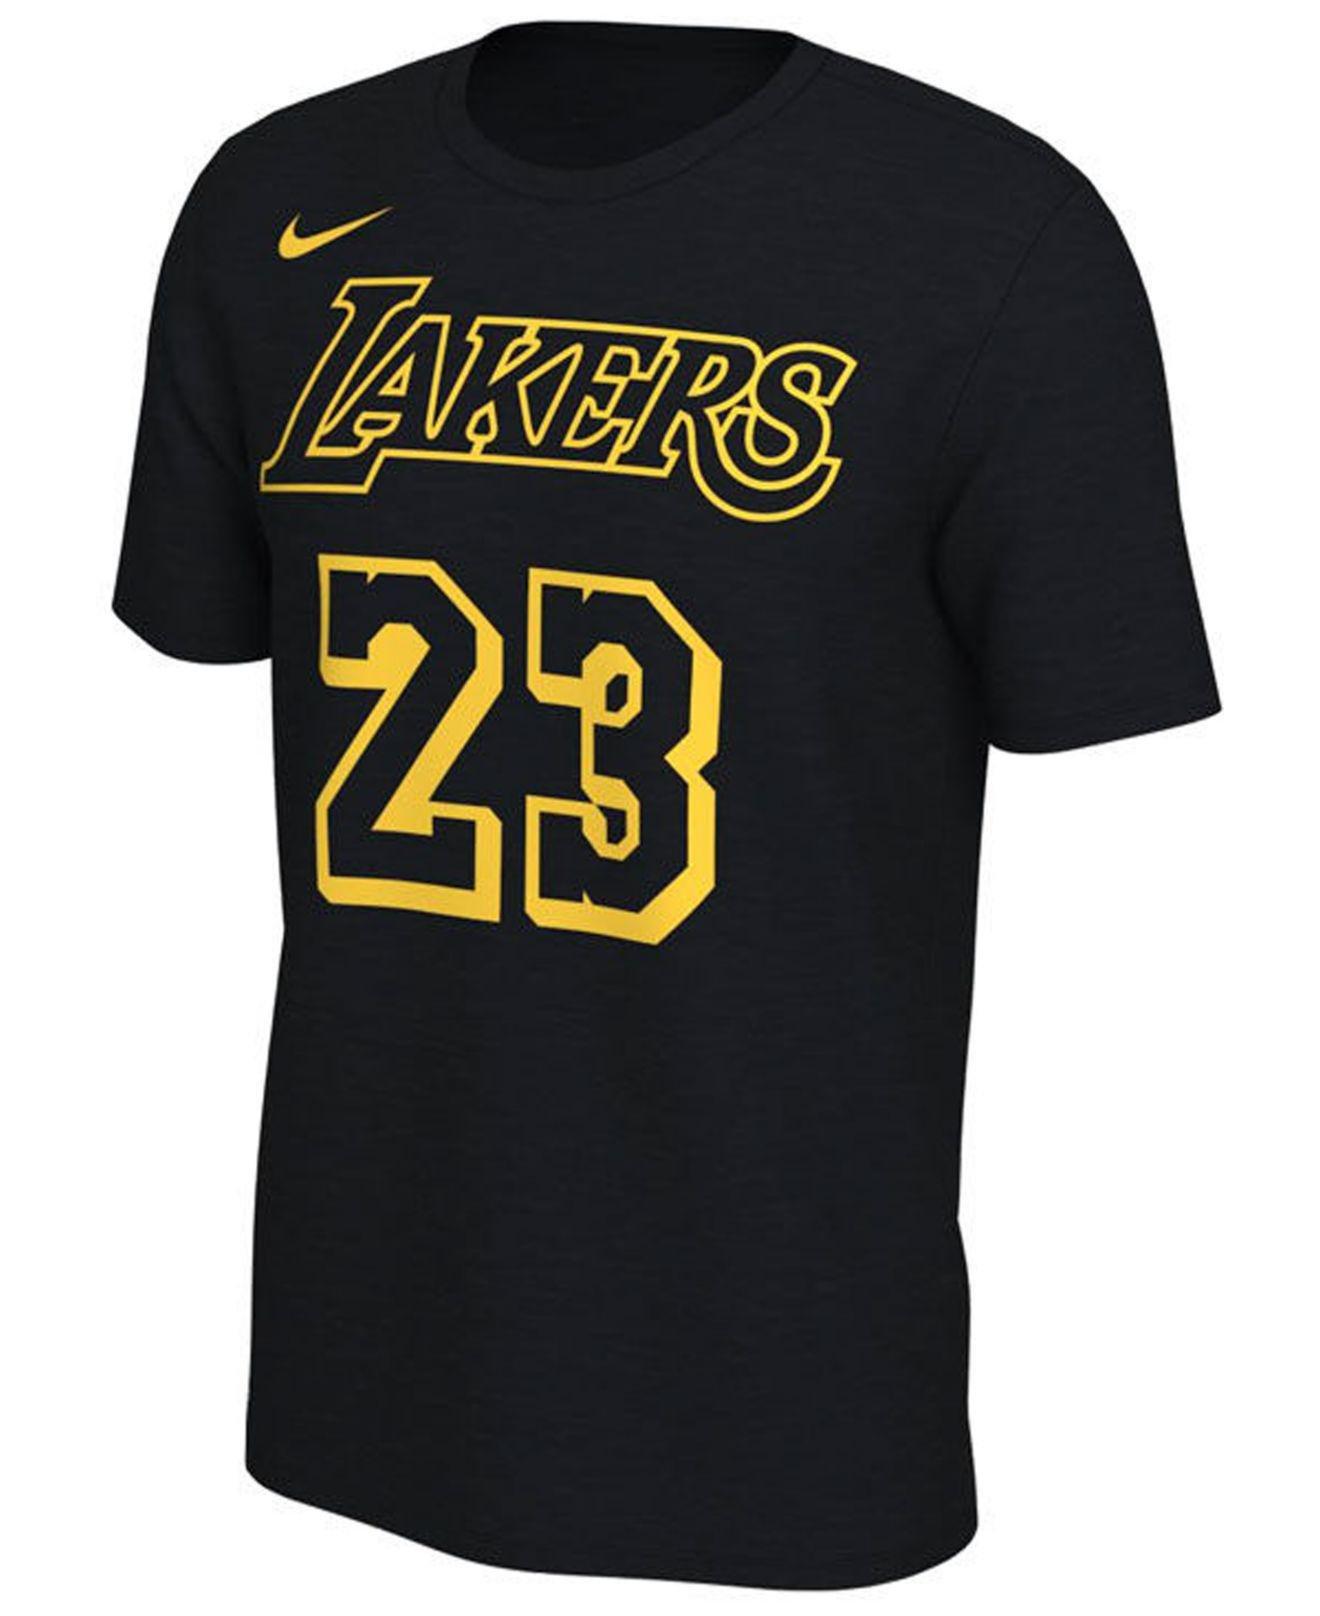 newest eca51 2e32e Men's Black Lebron James Los Angeles Lakers City Player T-shirt